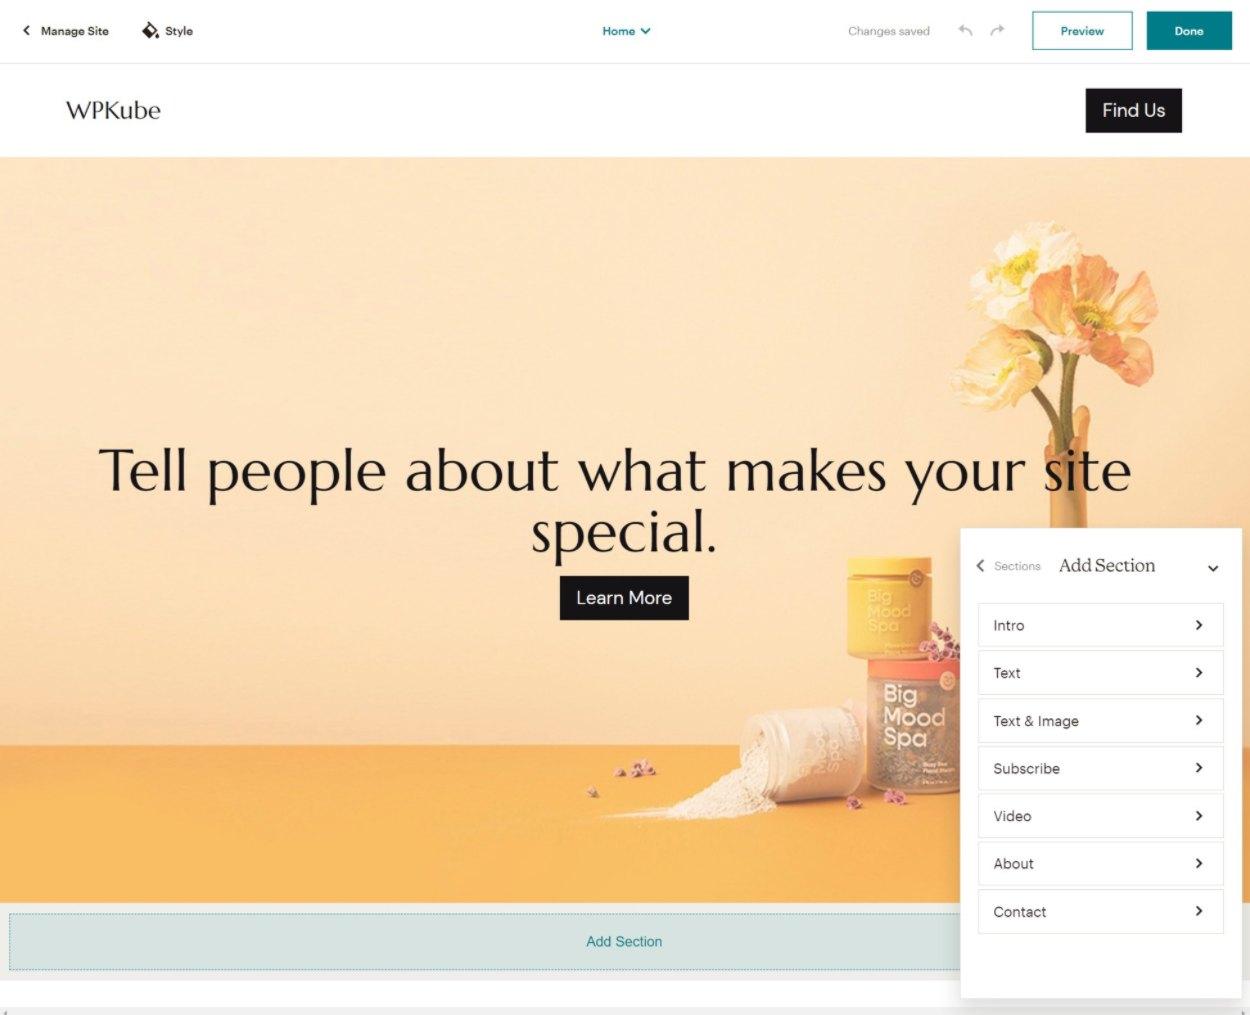 Mailchimp website builder